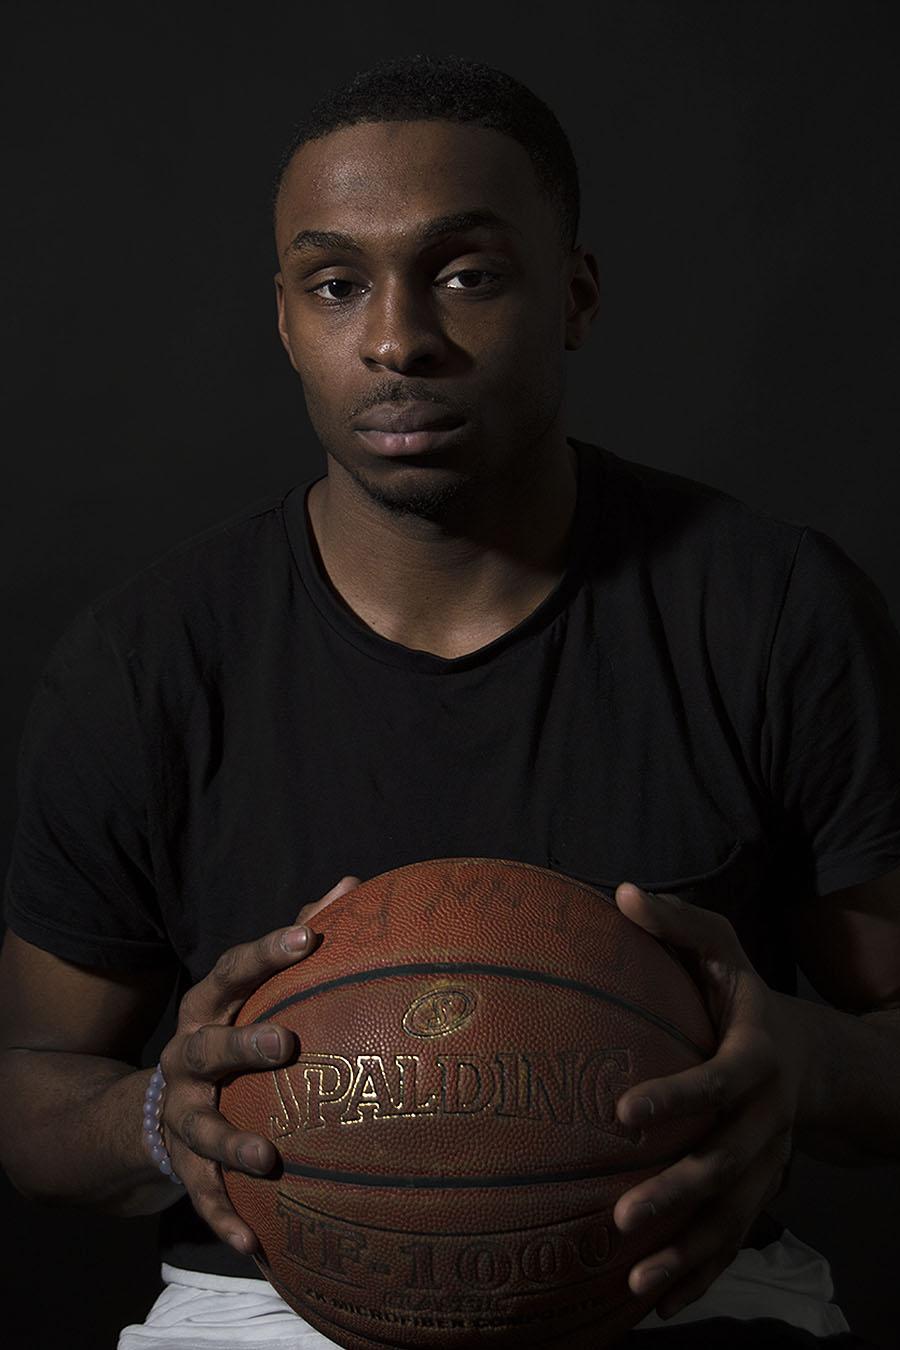 Soraya_Hebron_photography_tony_Hicks_portraiture_black_male_ivy_league_atheletes_basketball_players_fearless_back_muscular_spalding